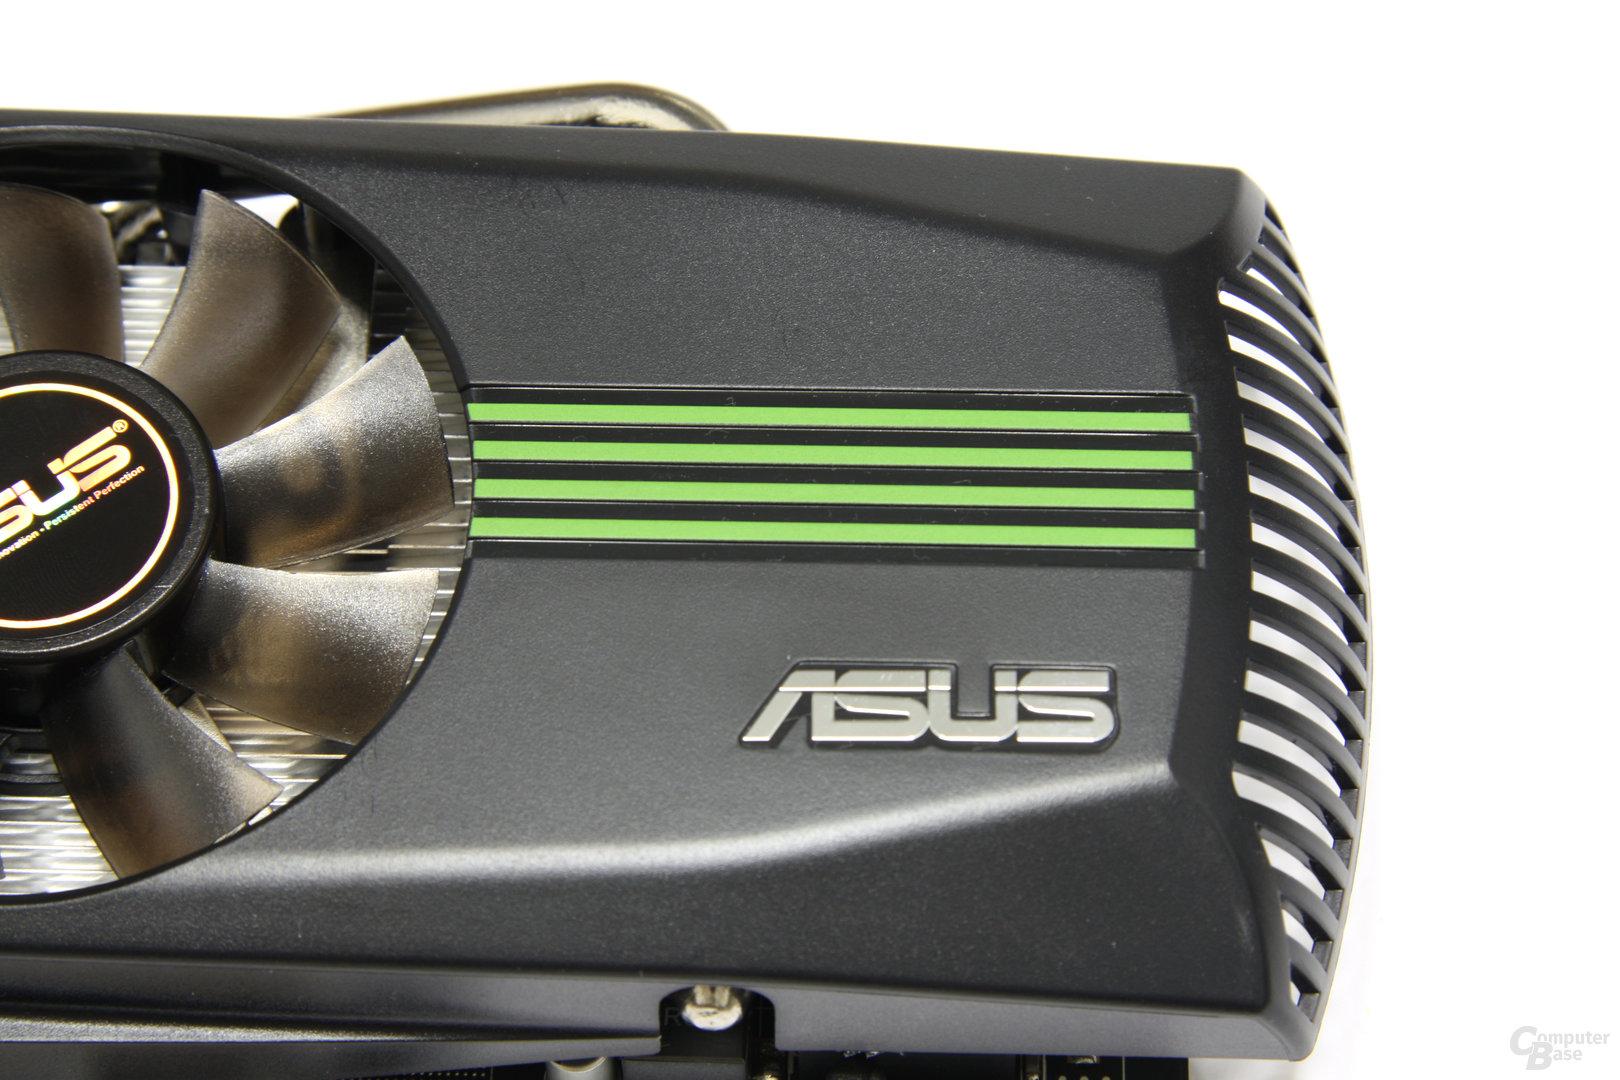 GeForce GTX 460 TOP Logo